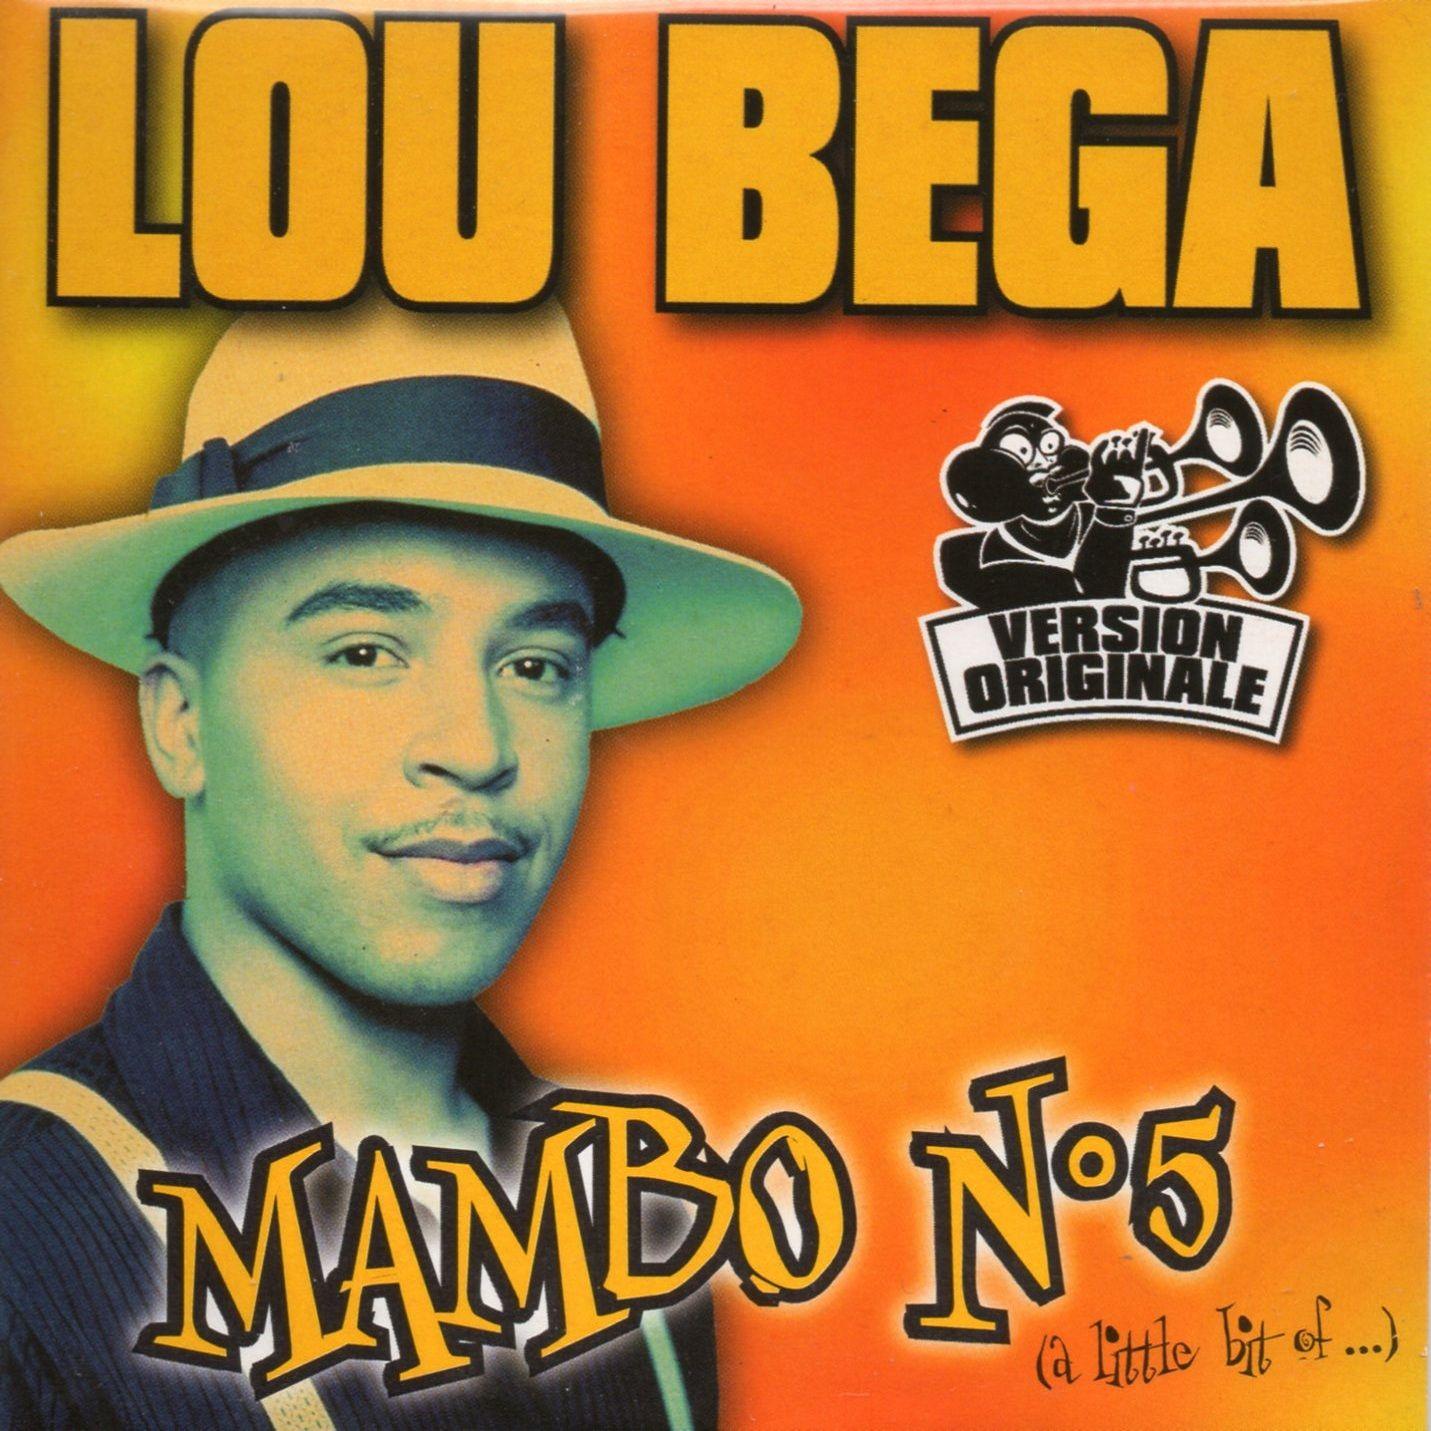 Acapellas.PW | Lou bega, Songs, Mambo